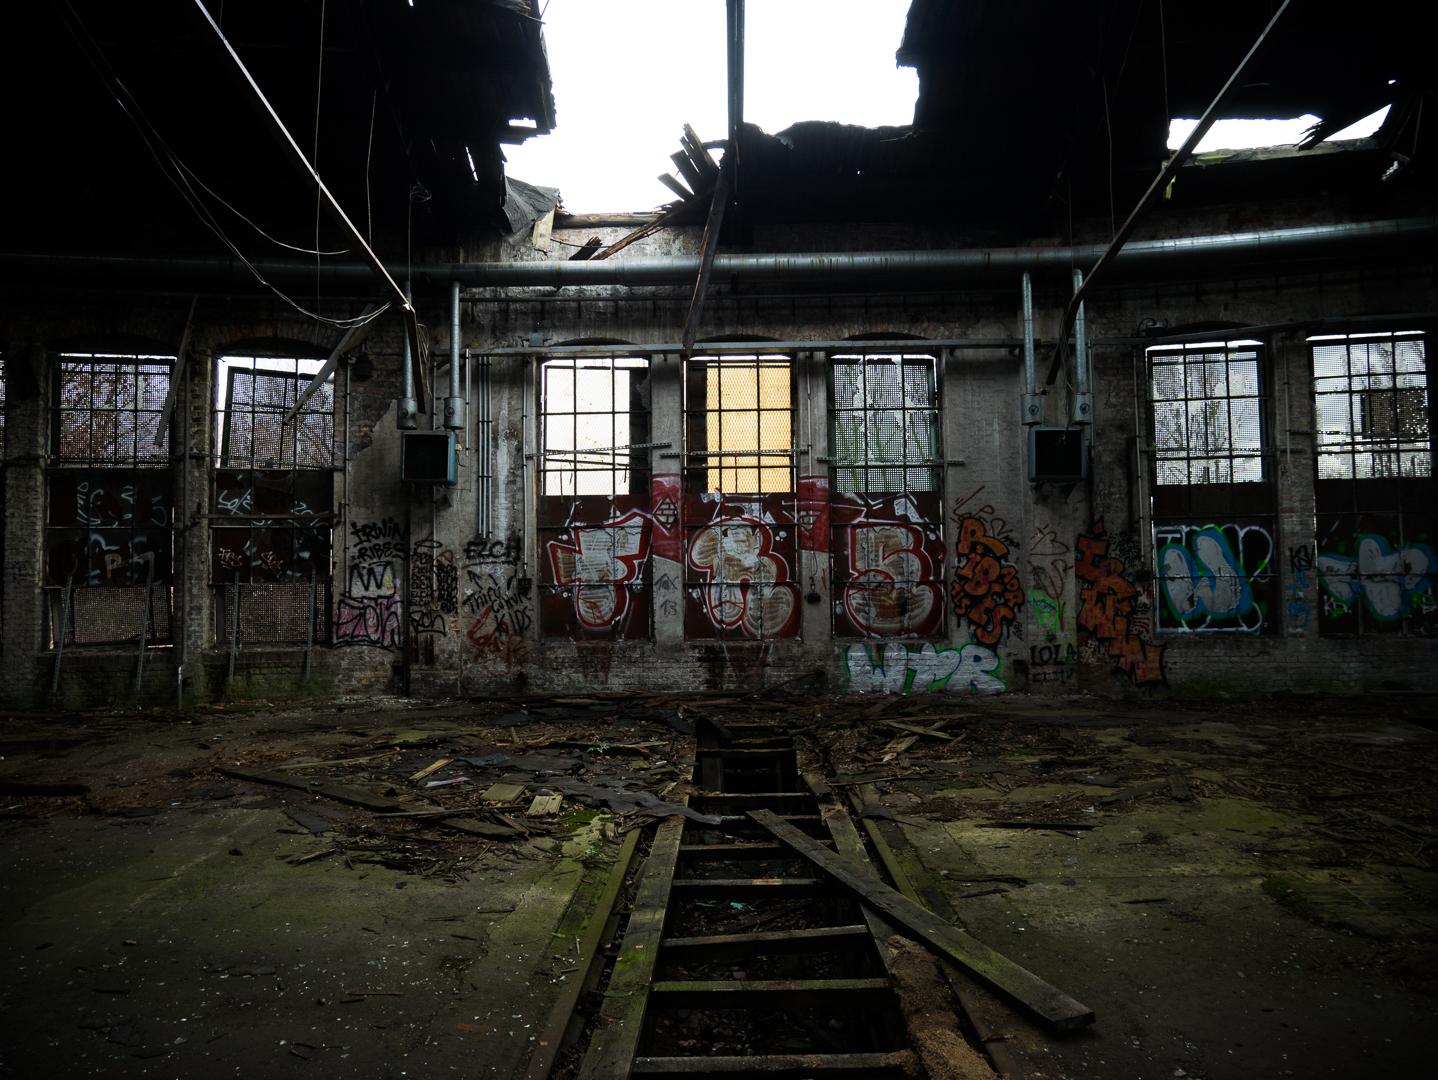 GERMANY, Berlin – Abandoned train repair station. © Marko Kecma